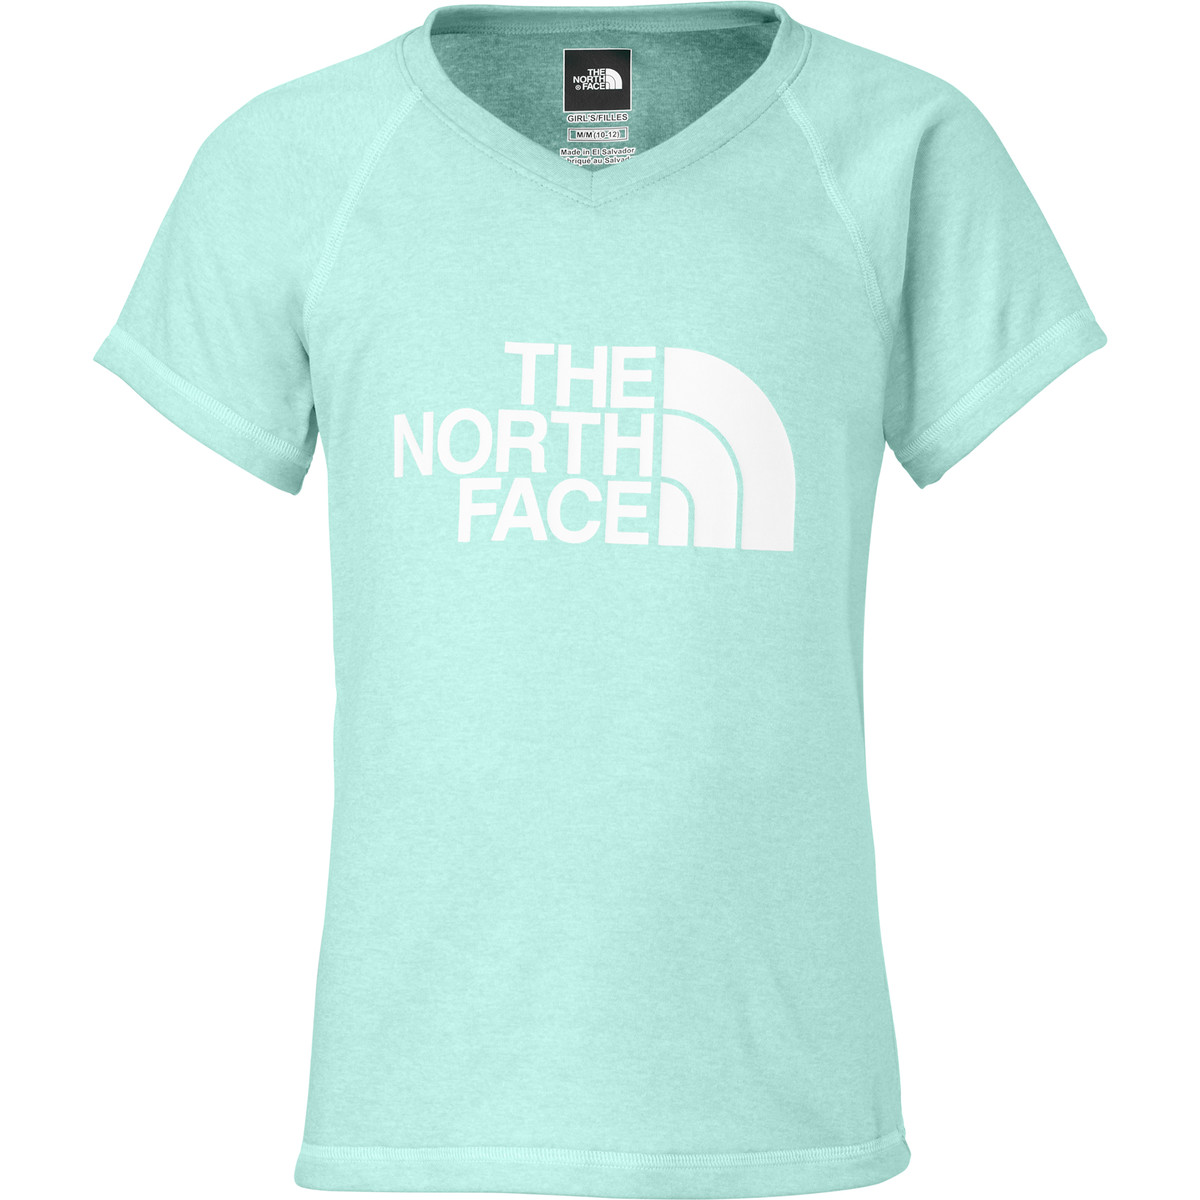 The North Face Moksha Performance Tee